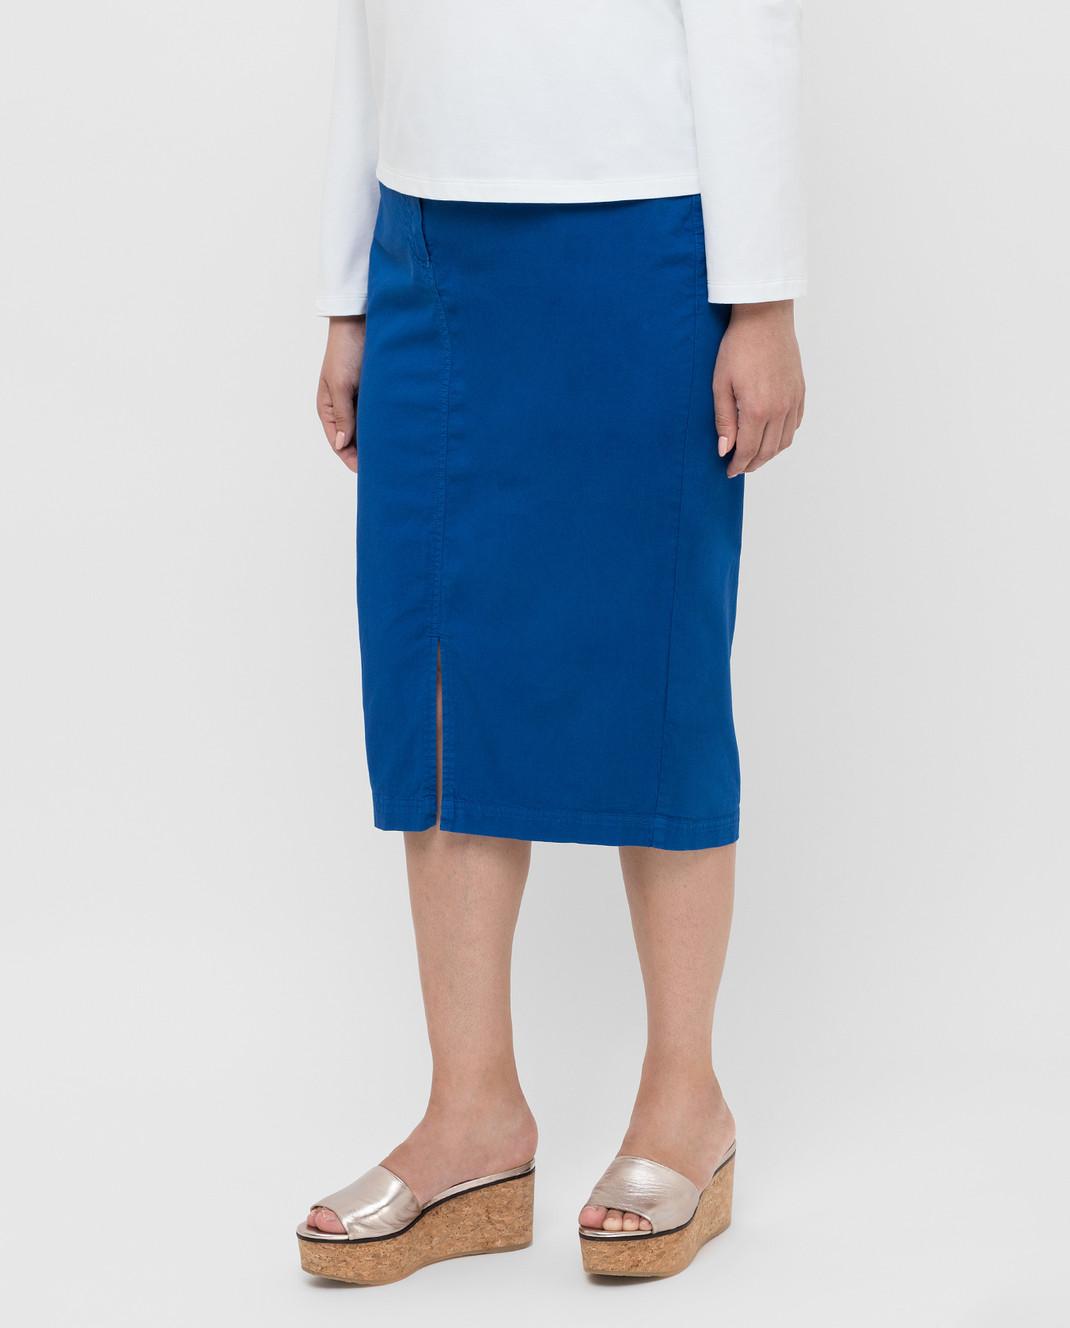 Marina Sport by Marina Rinaldi Темно-синяя джинсовая юбка CAROTENE изображение 3